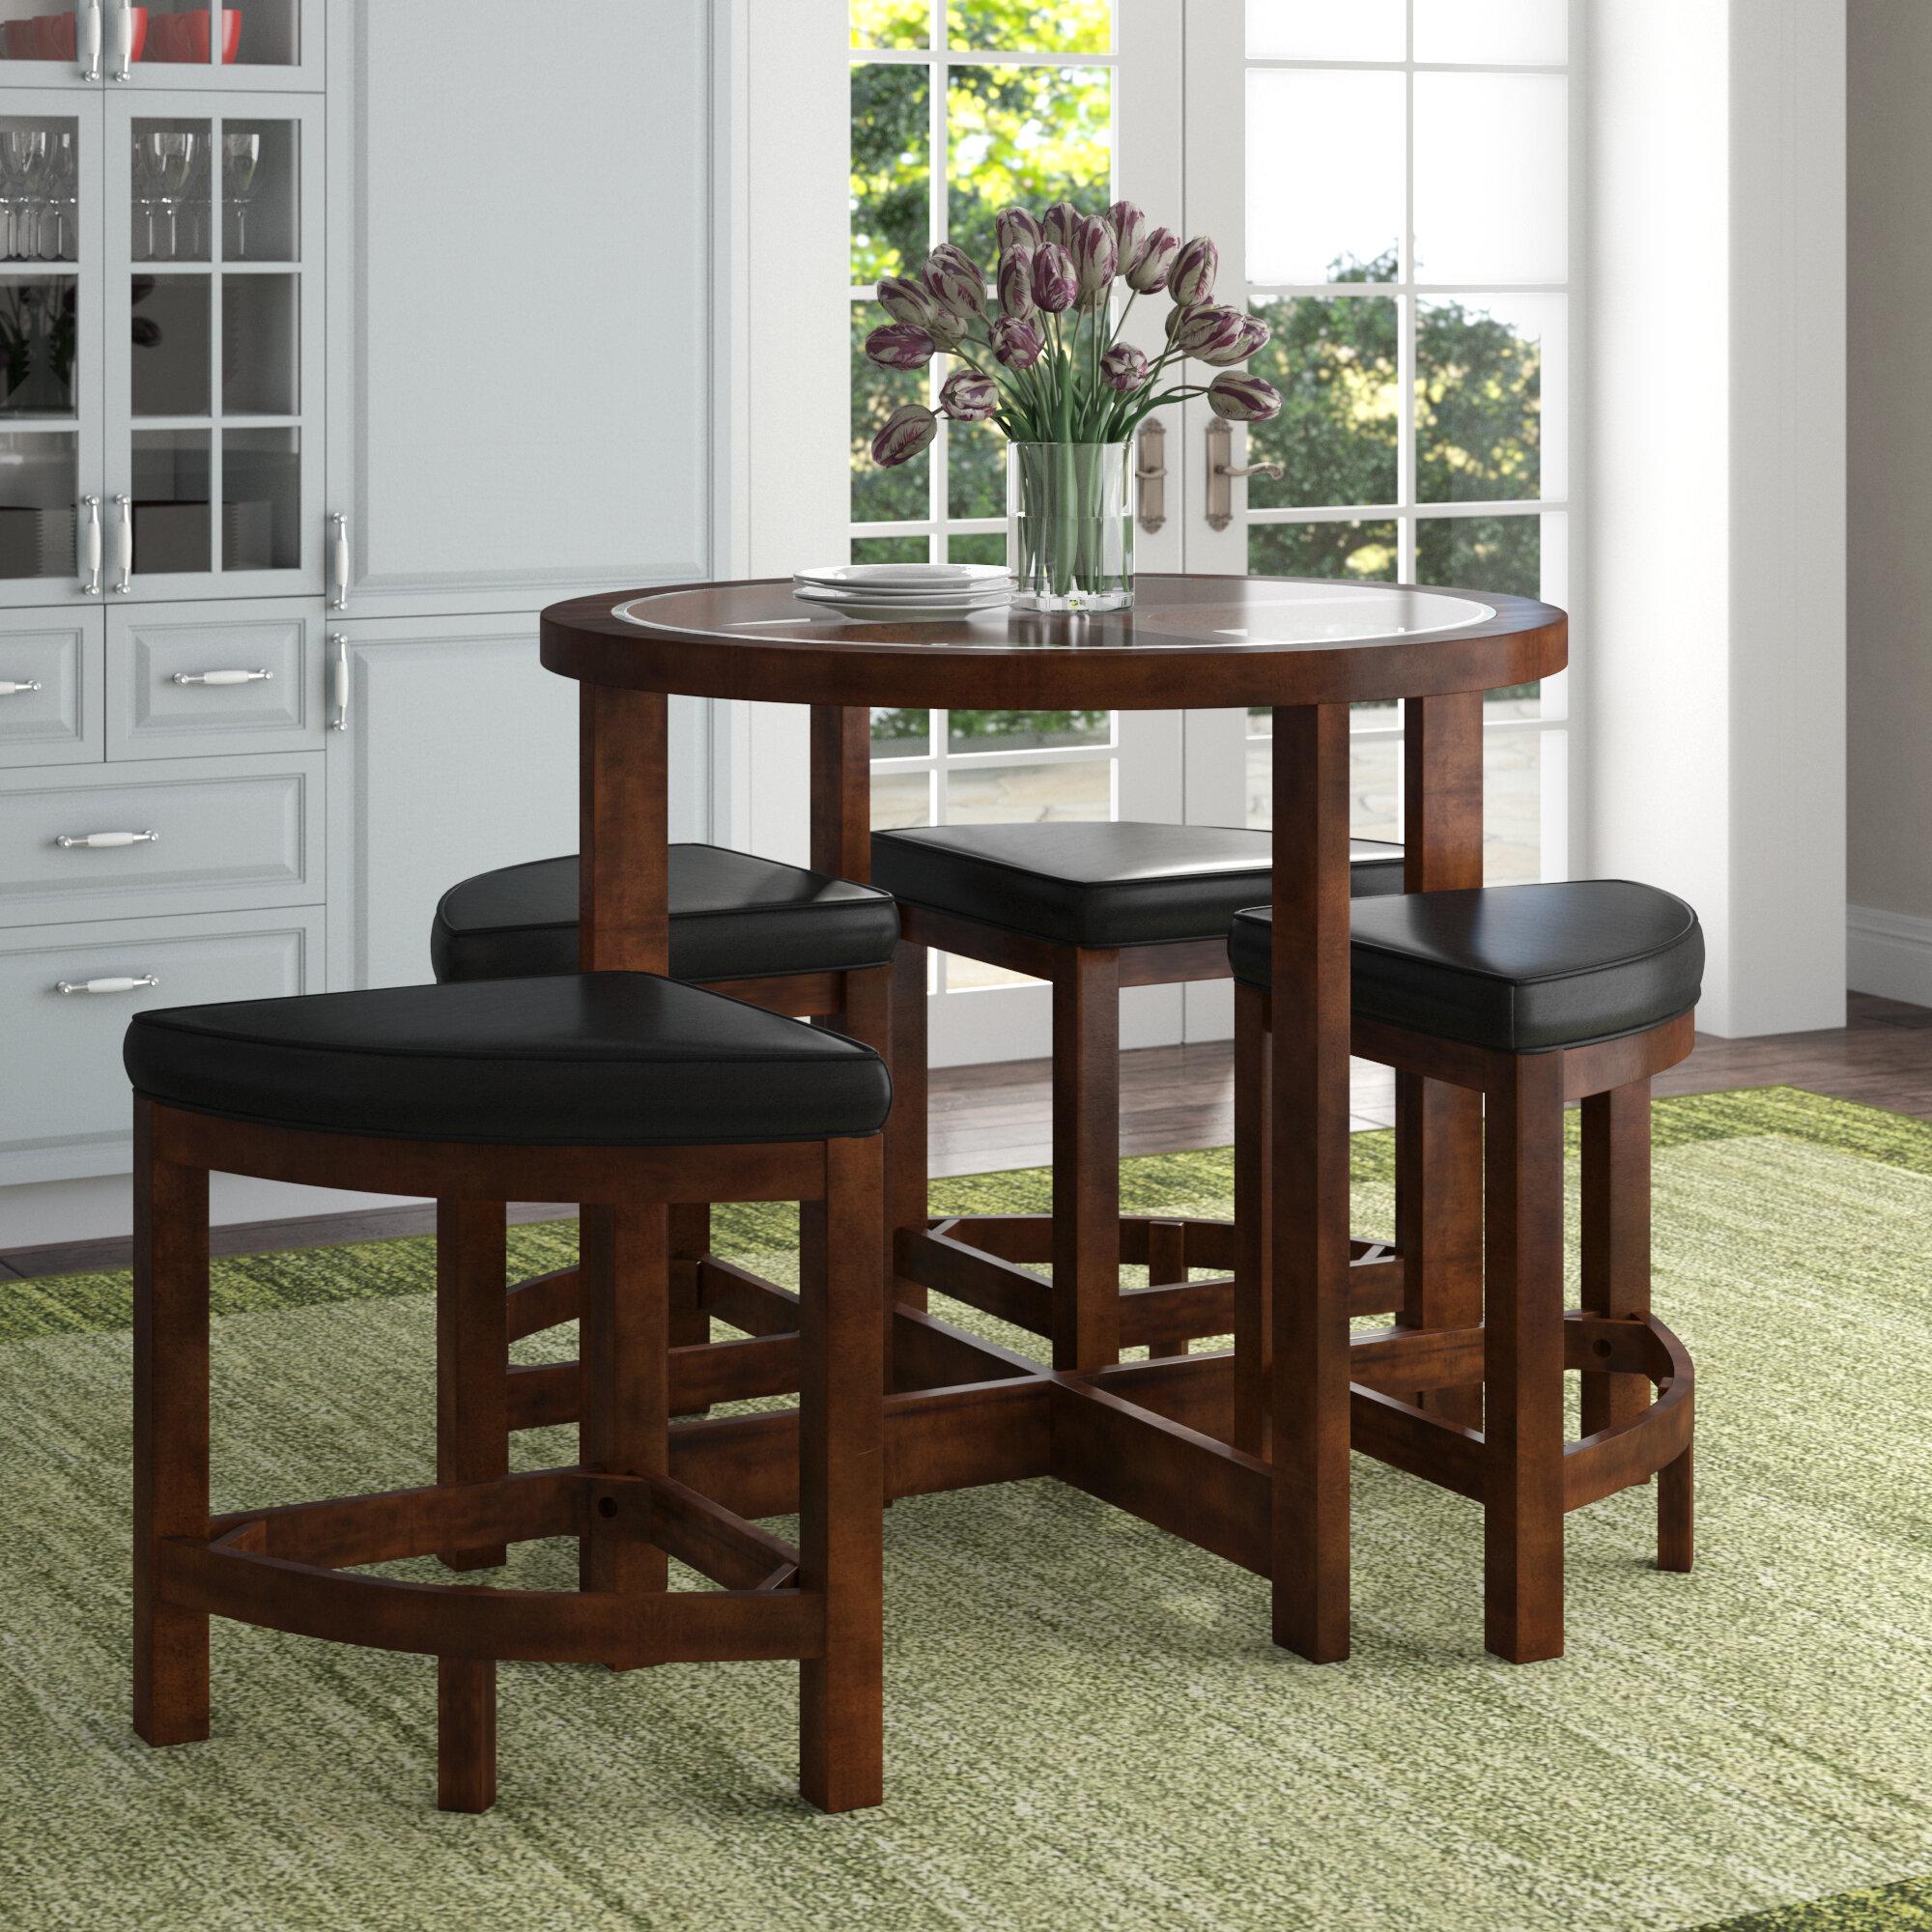 Red Barrel Studio Jinie 5 Piece Counter Height Pub Table Set U0026 Reviews |  Wayfair